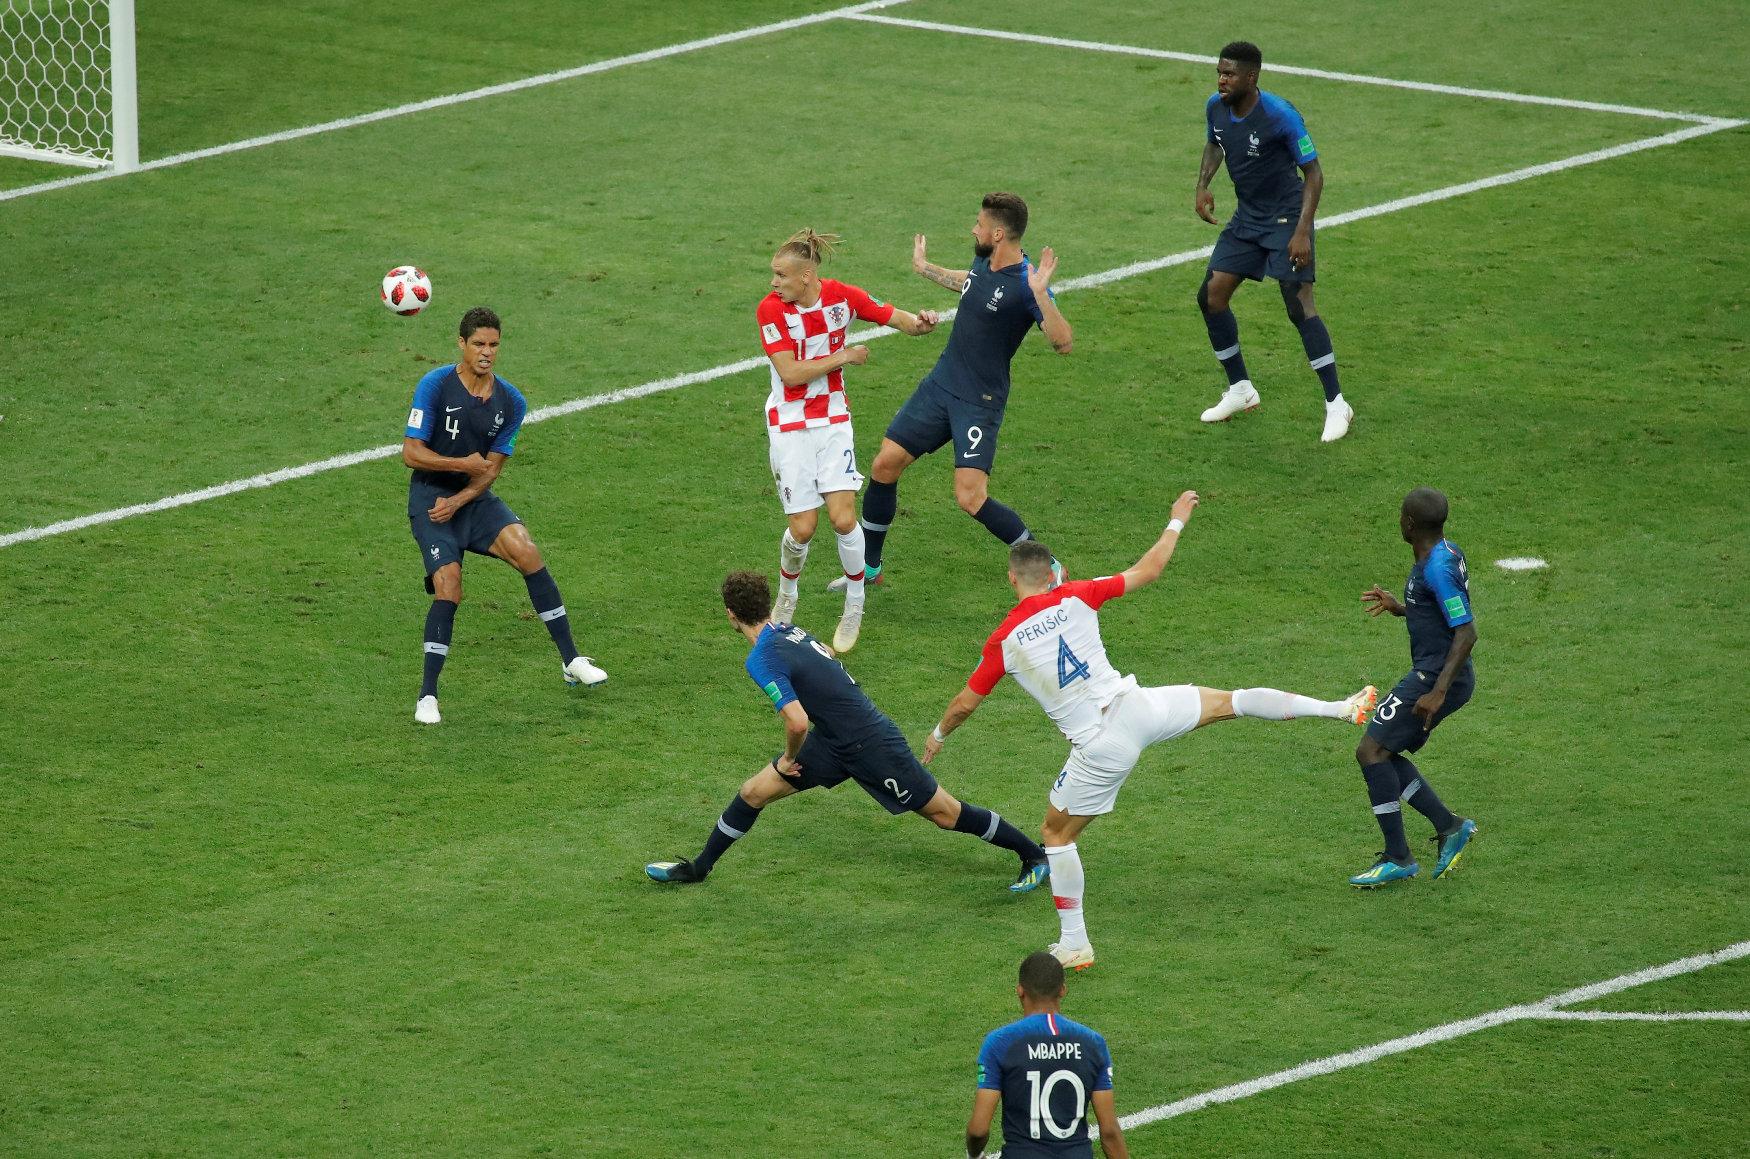 Soccer Football - World Cup - Final - France v Croatia - Luzhniki Stadium, Moscow, Russia - July 15, 2018  Croatia's Ivan Perisic scores their first goal   REUTERS/Maxim Shemetov